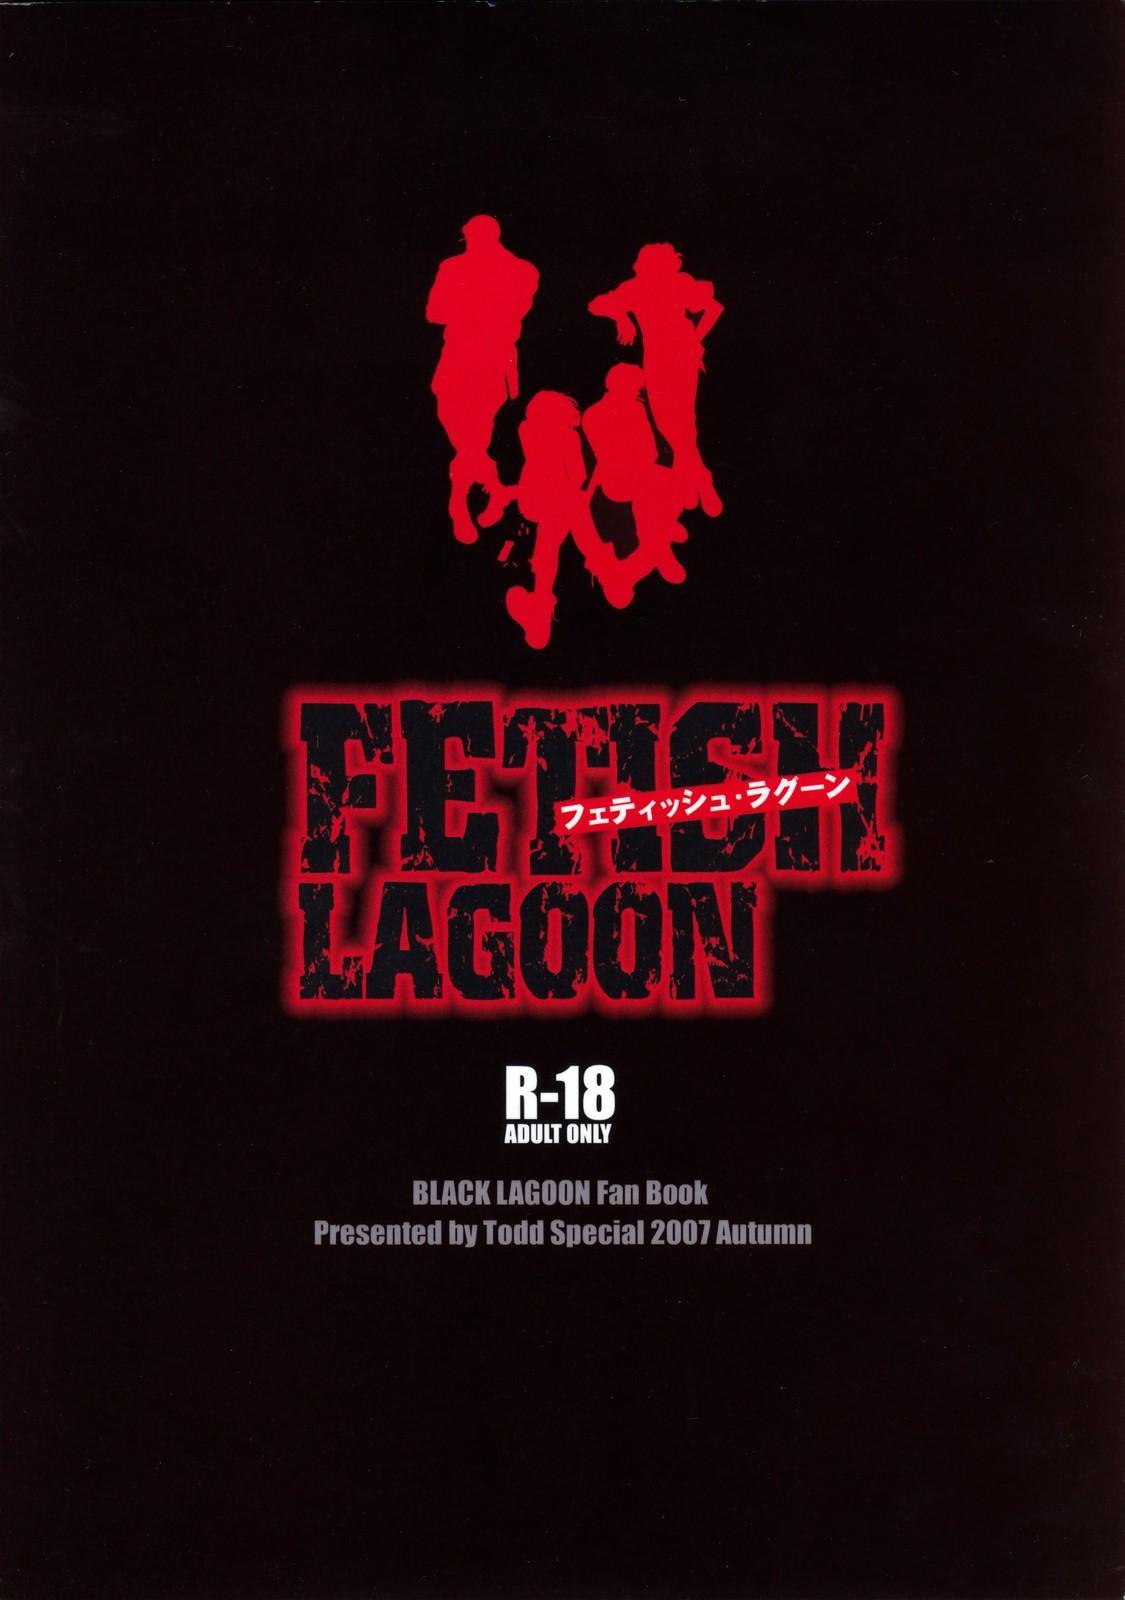 FETISH LAGOON 25